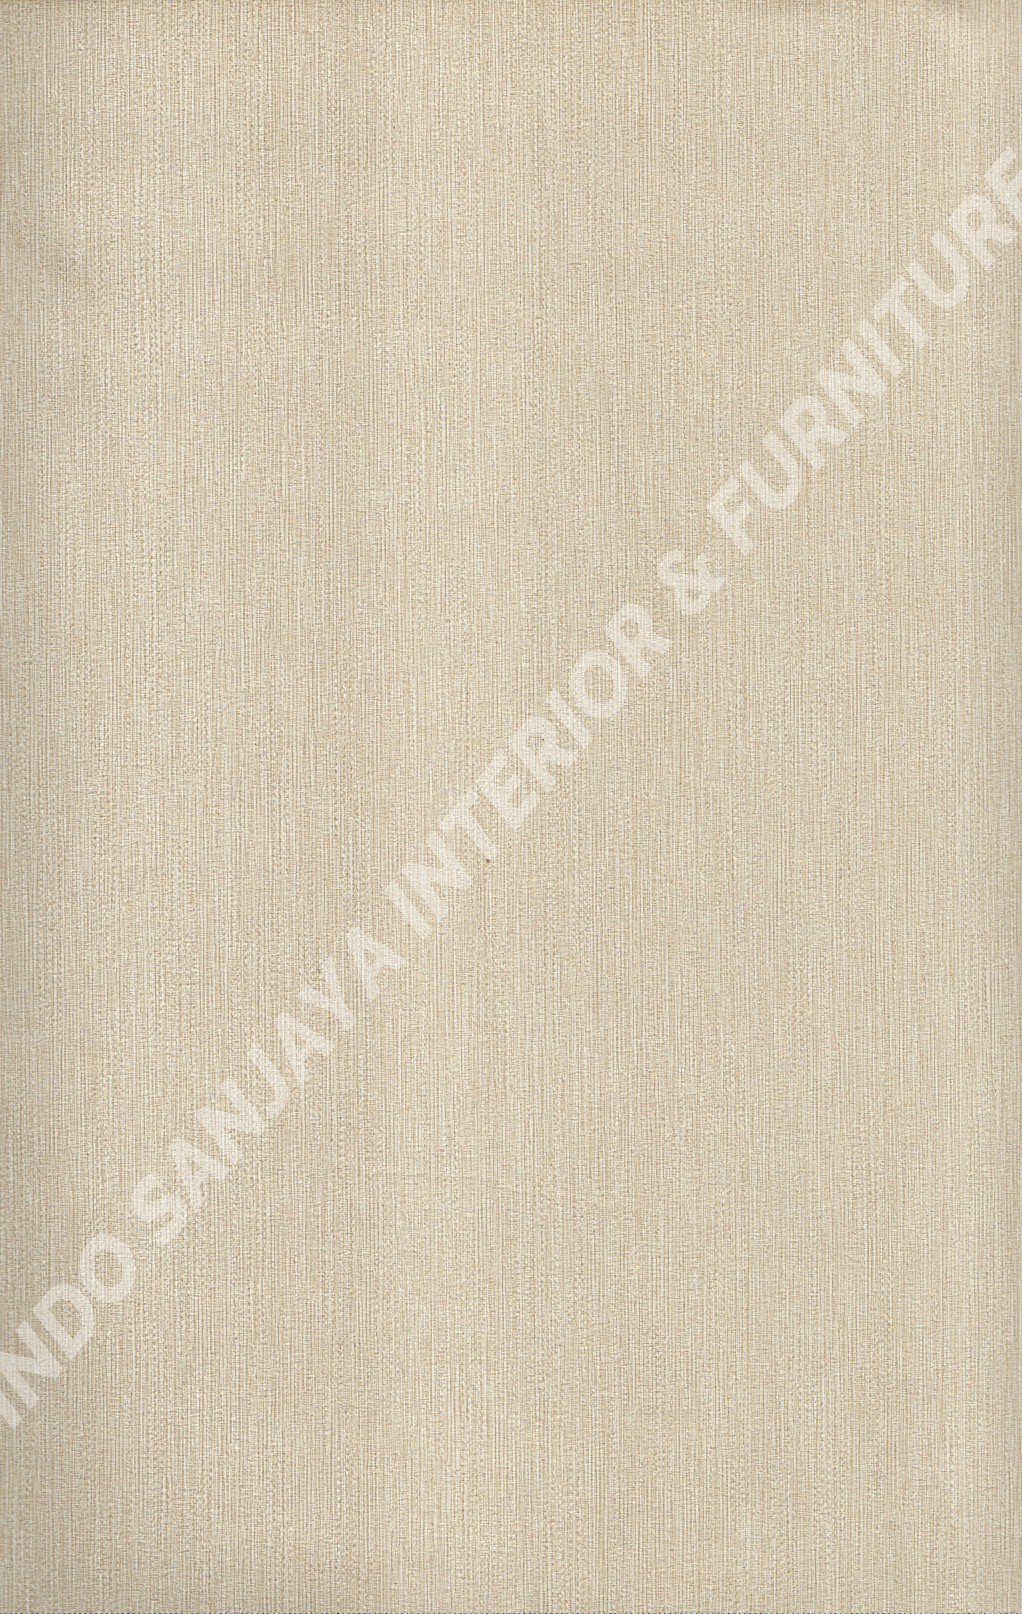 wallpaper BONITO:81084-3 corak Minimalis / Polos warna Cream ,Coklat